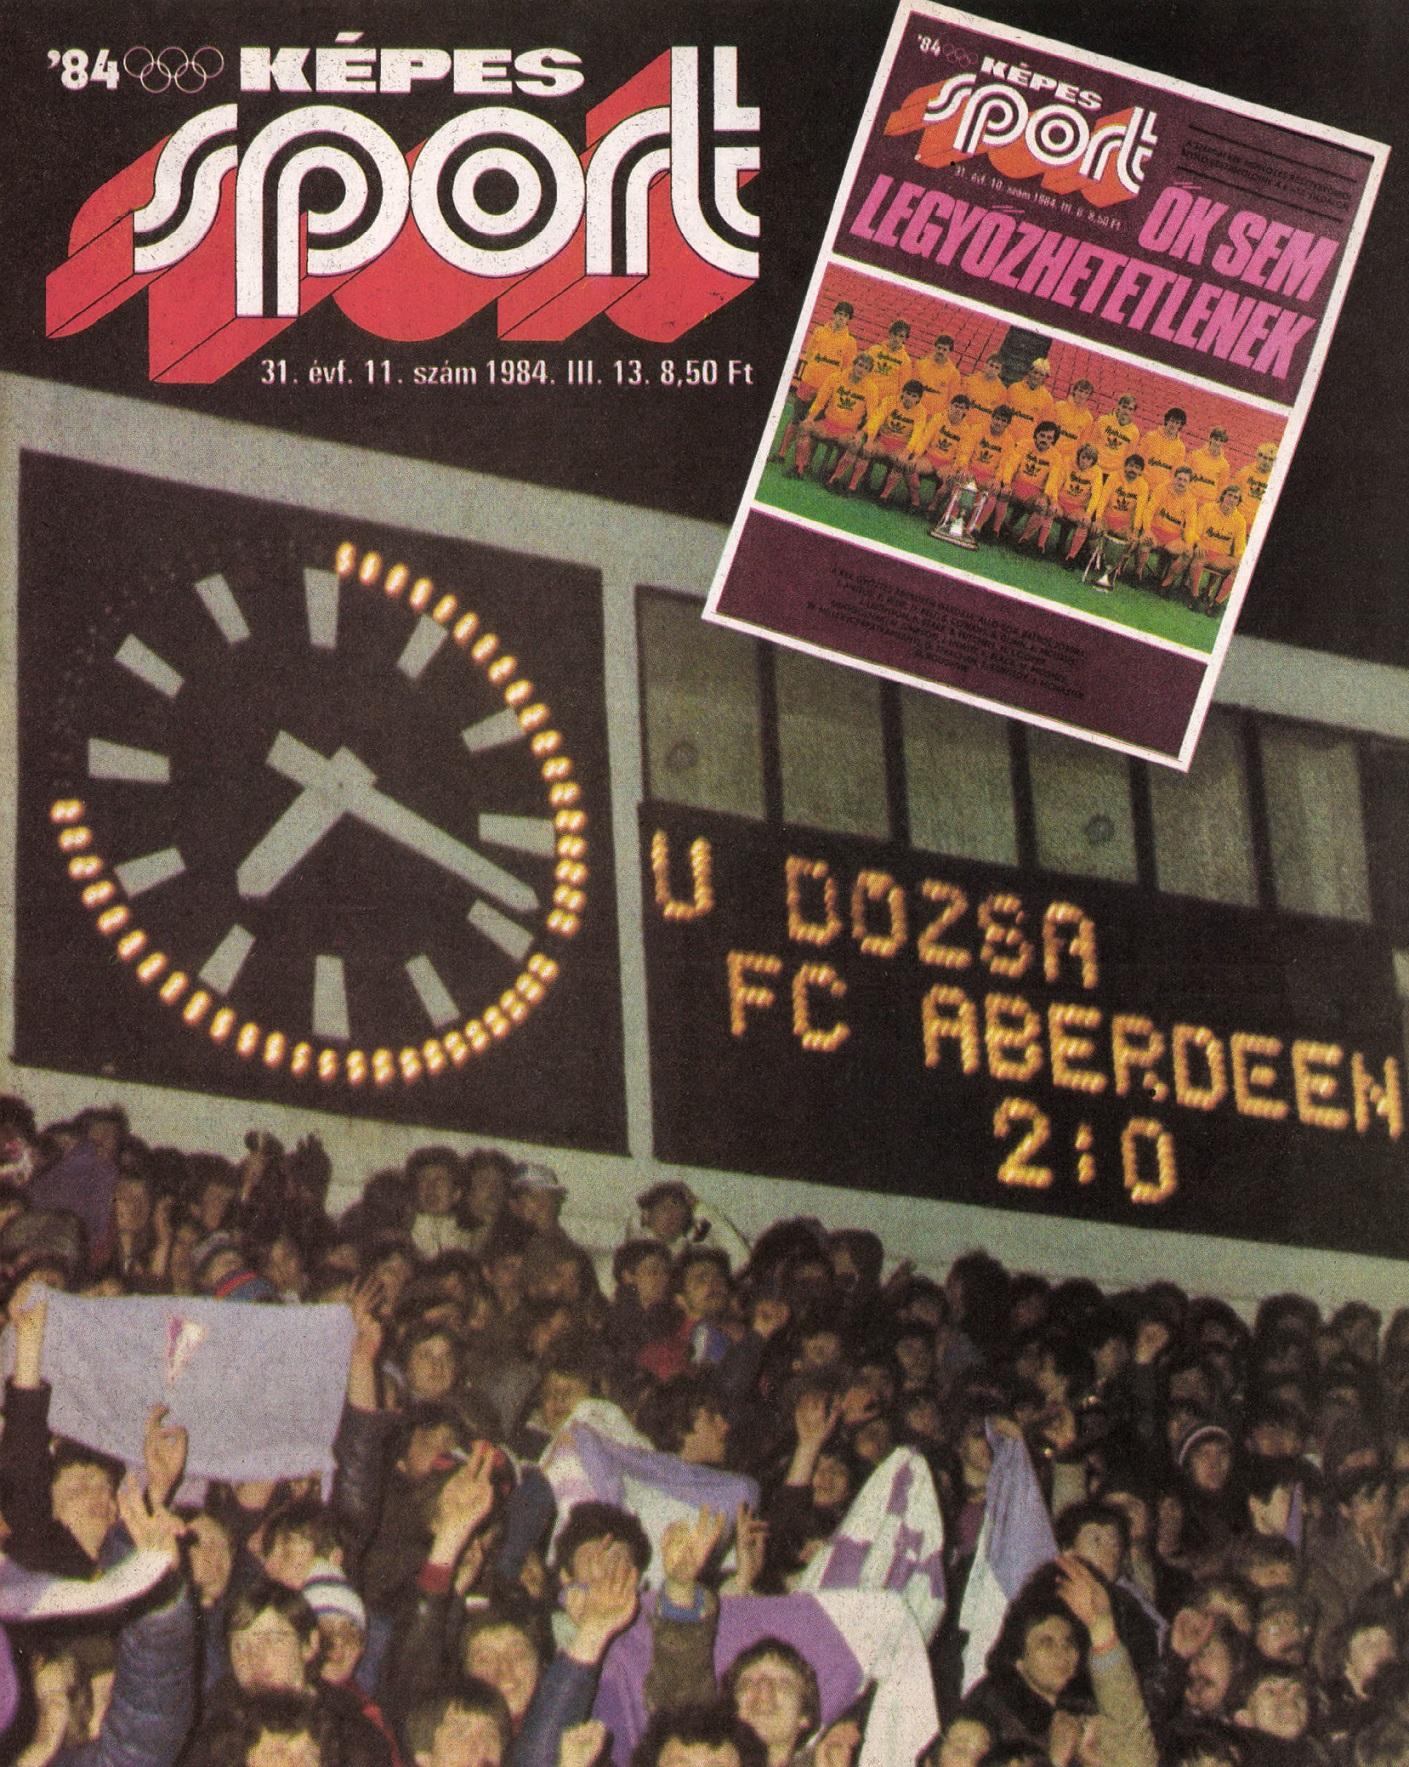 idokapszula_nb_i_1983_84_klubcsapataink_nemzetkozi_kupaszereplese_3_fordulo_1_kor_u_dozsa_aberdeen_lelato.jpg